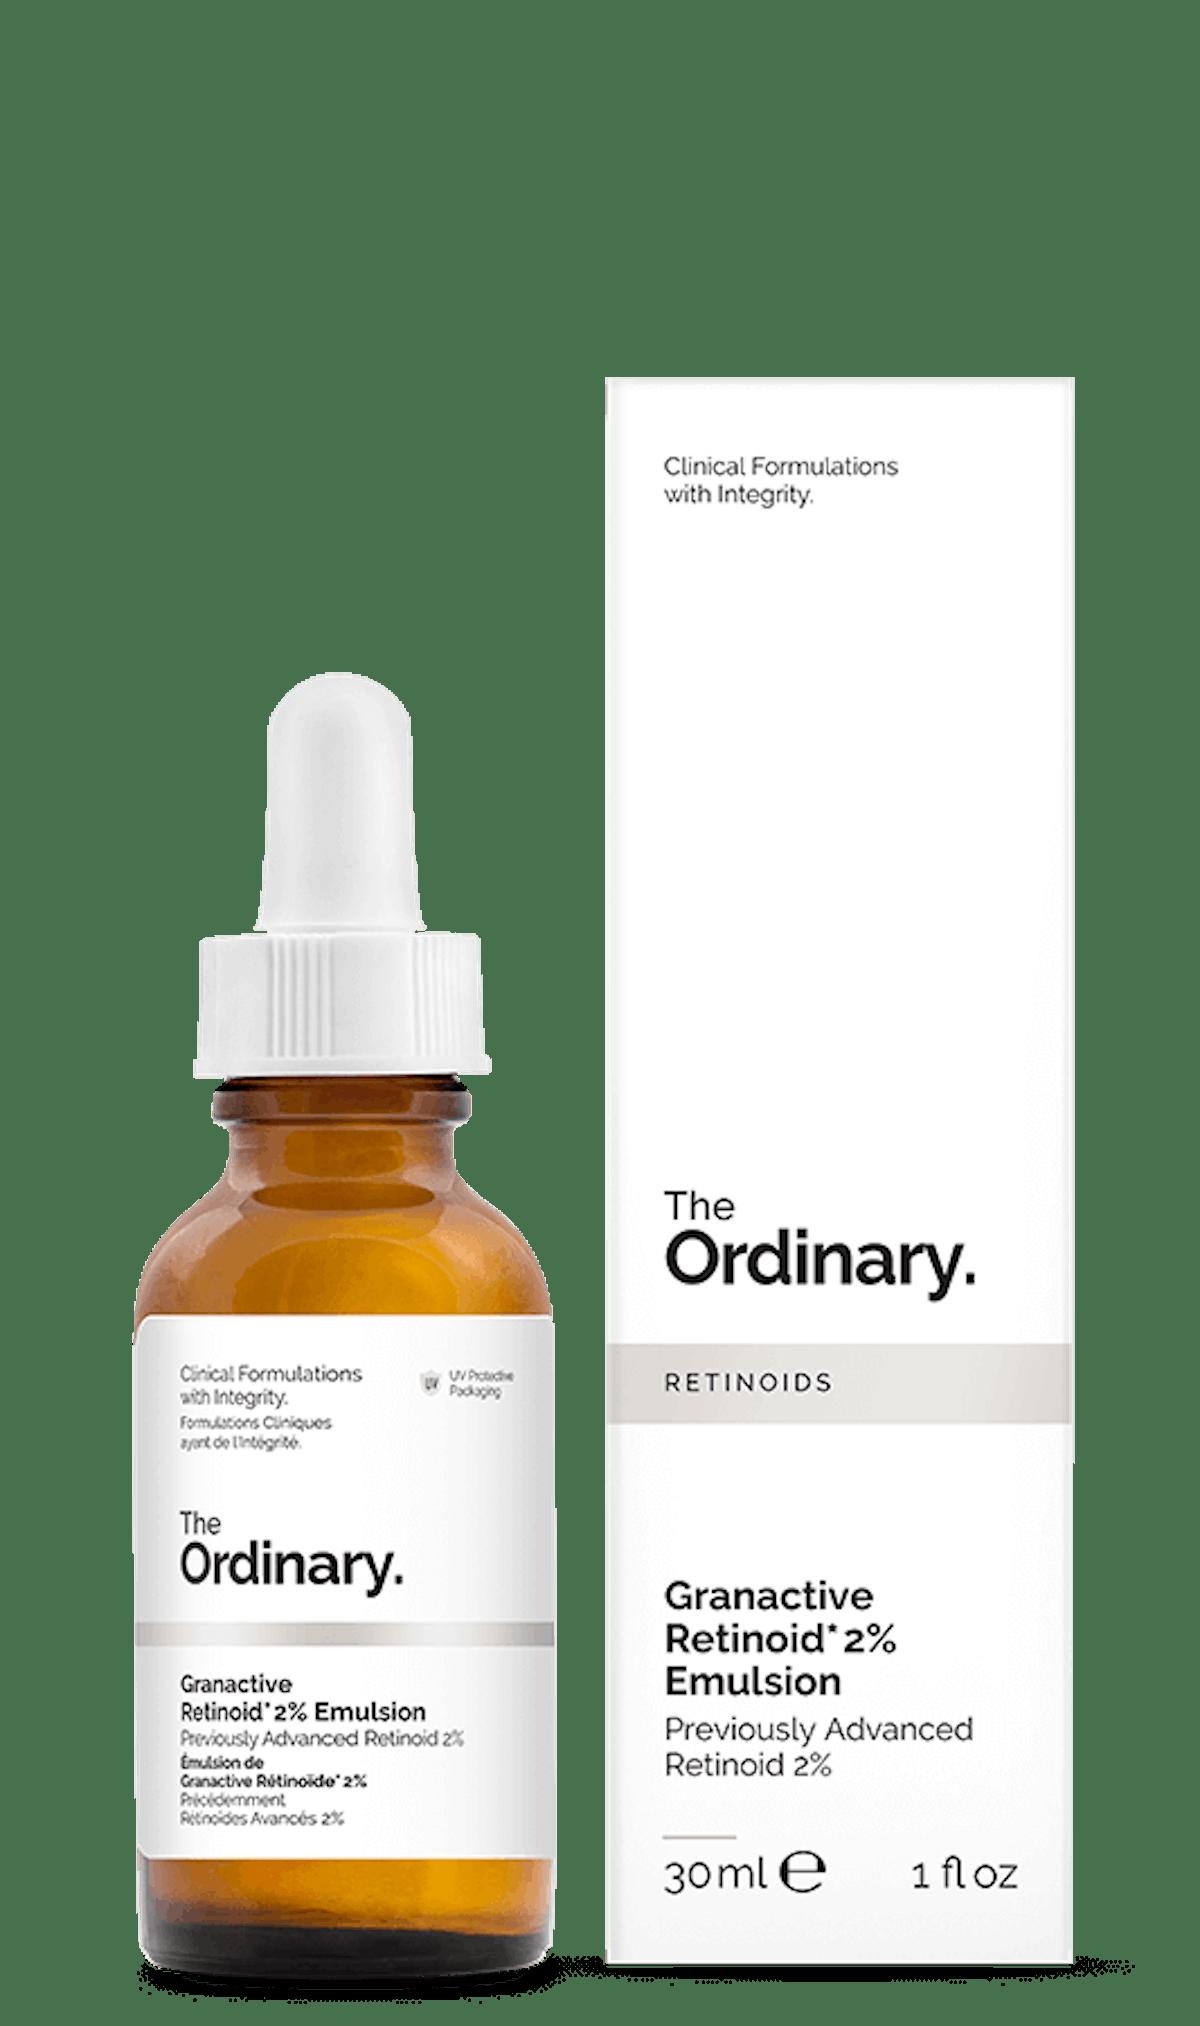 Granactive Retinoid 2% Emulsion